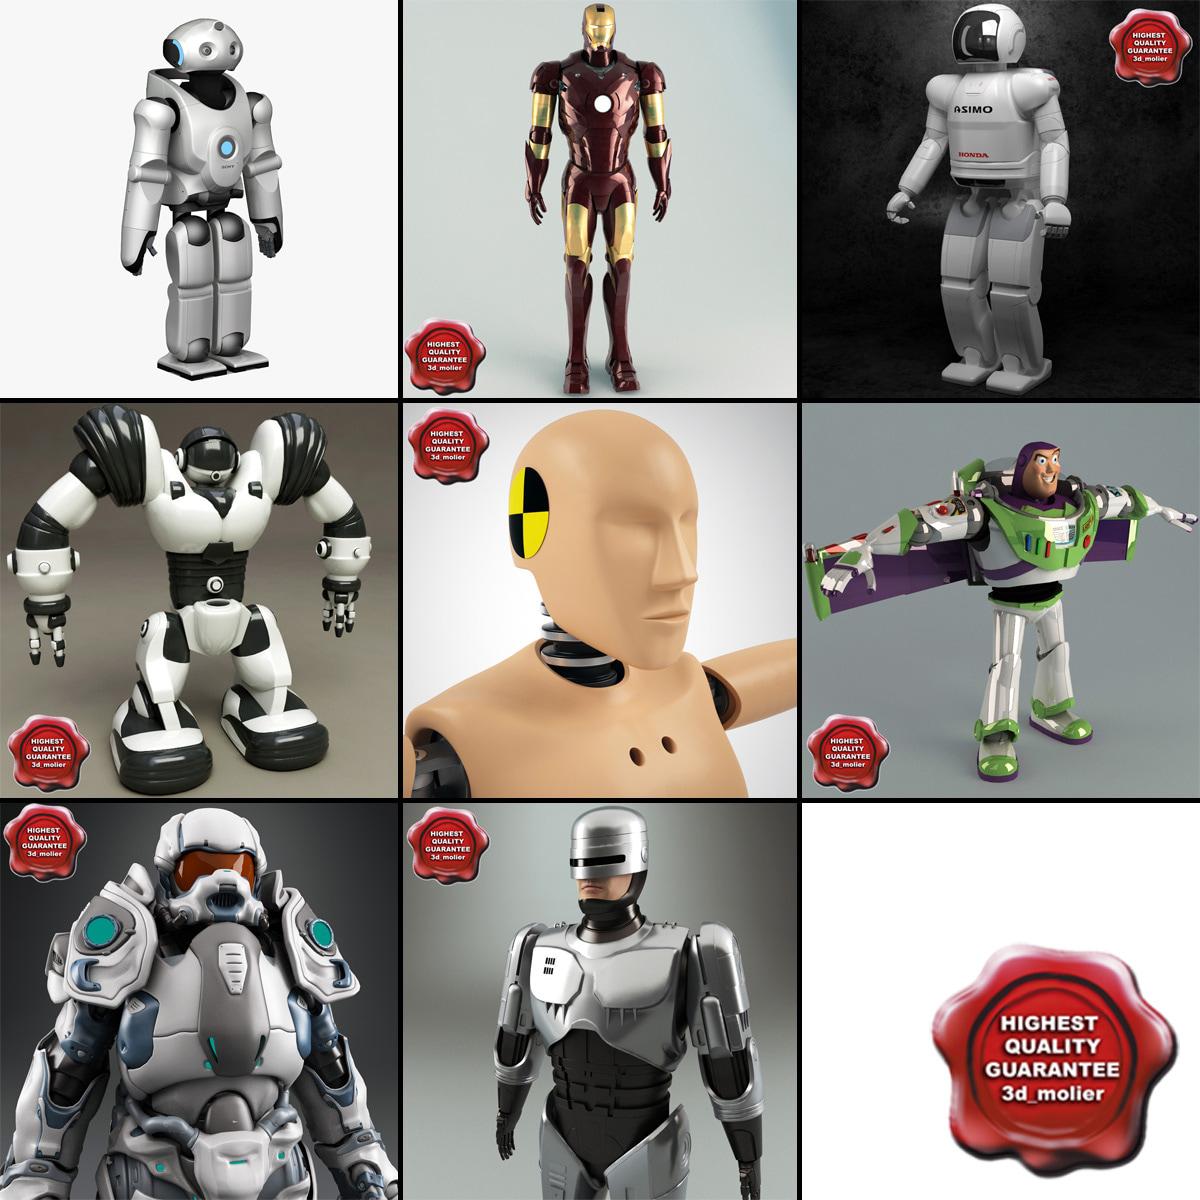 Robots_Collection_V6_000.jpg